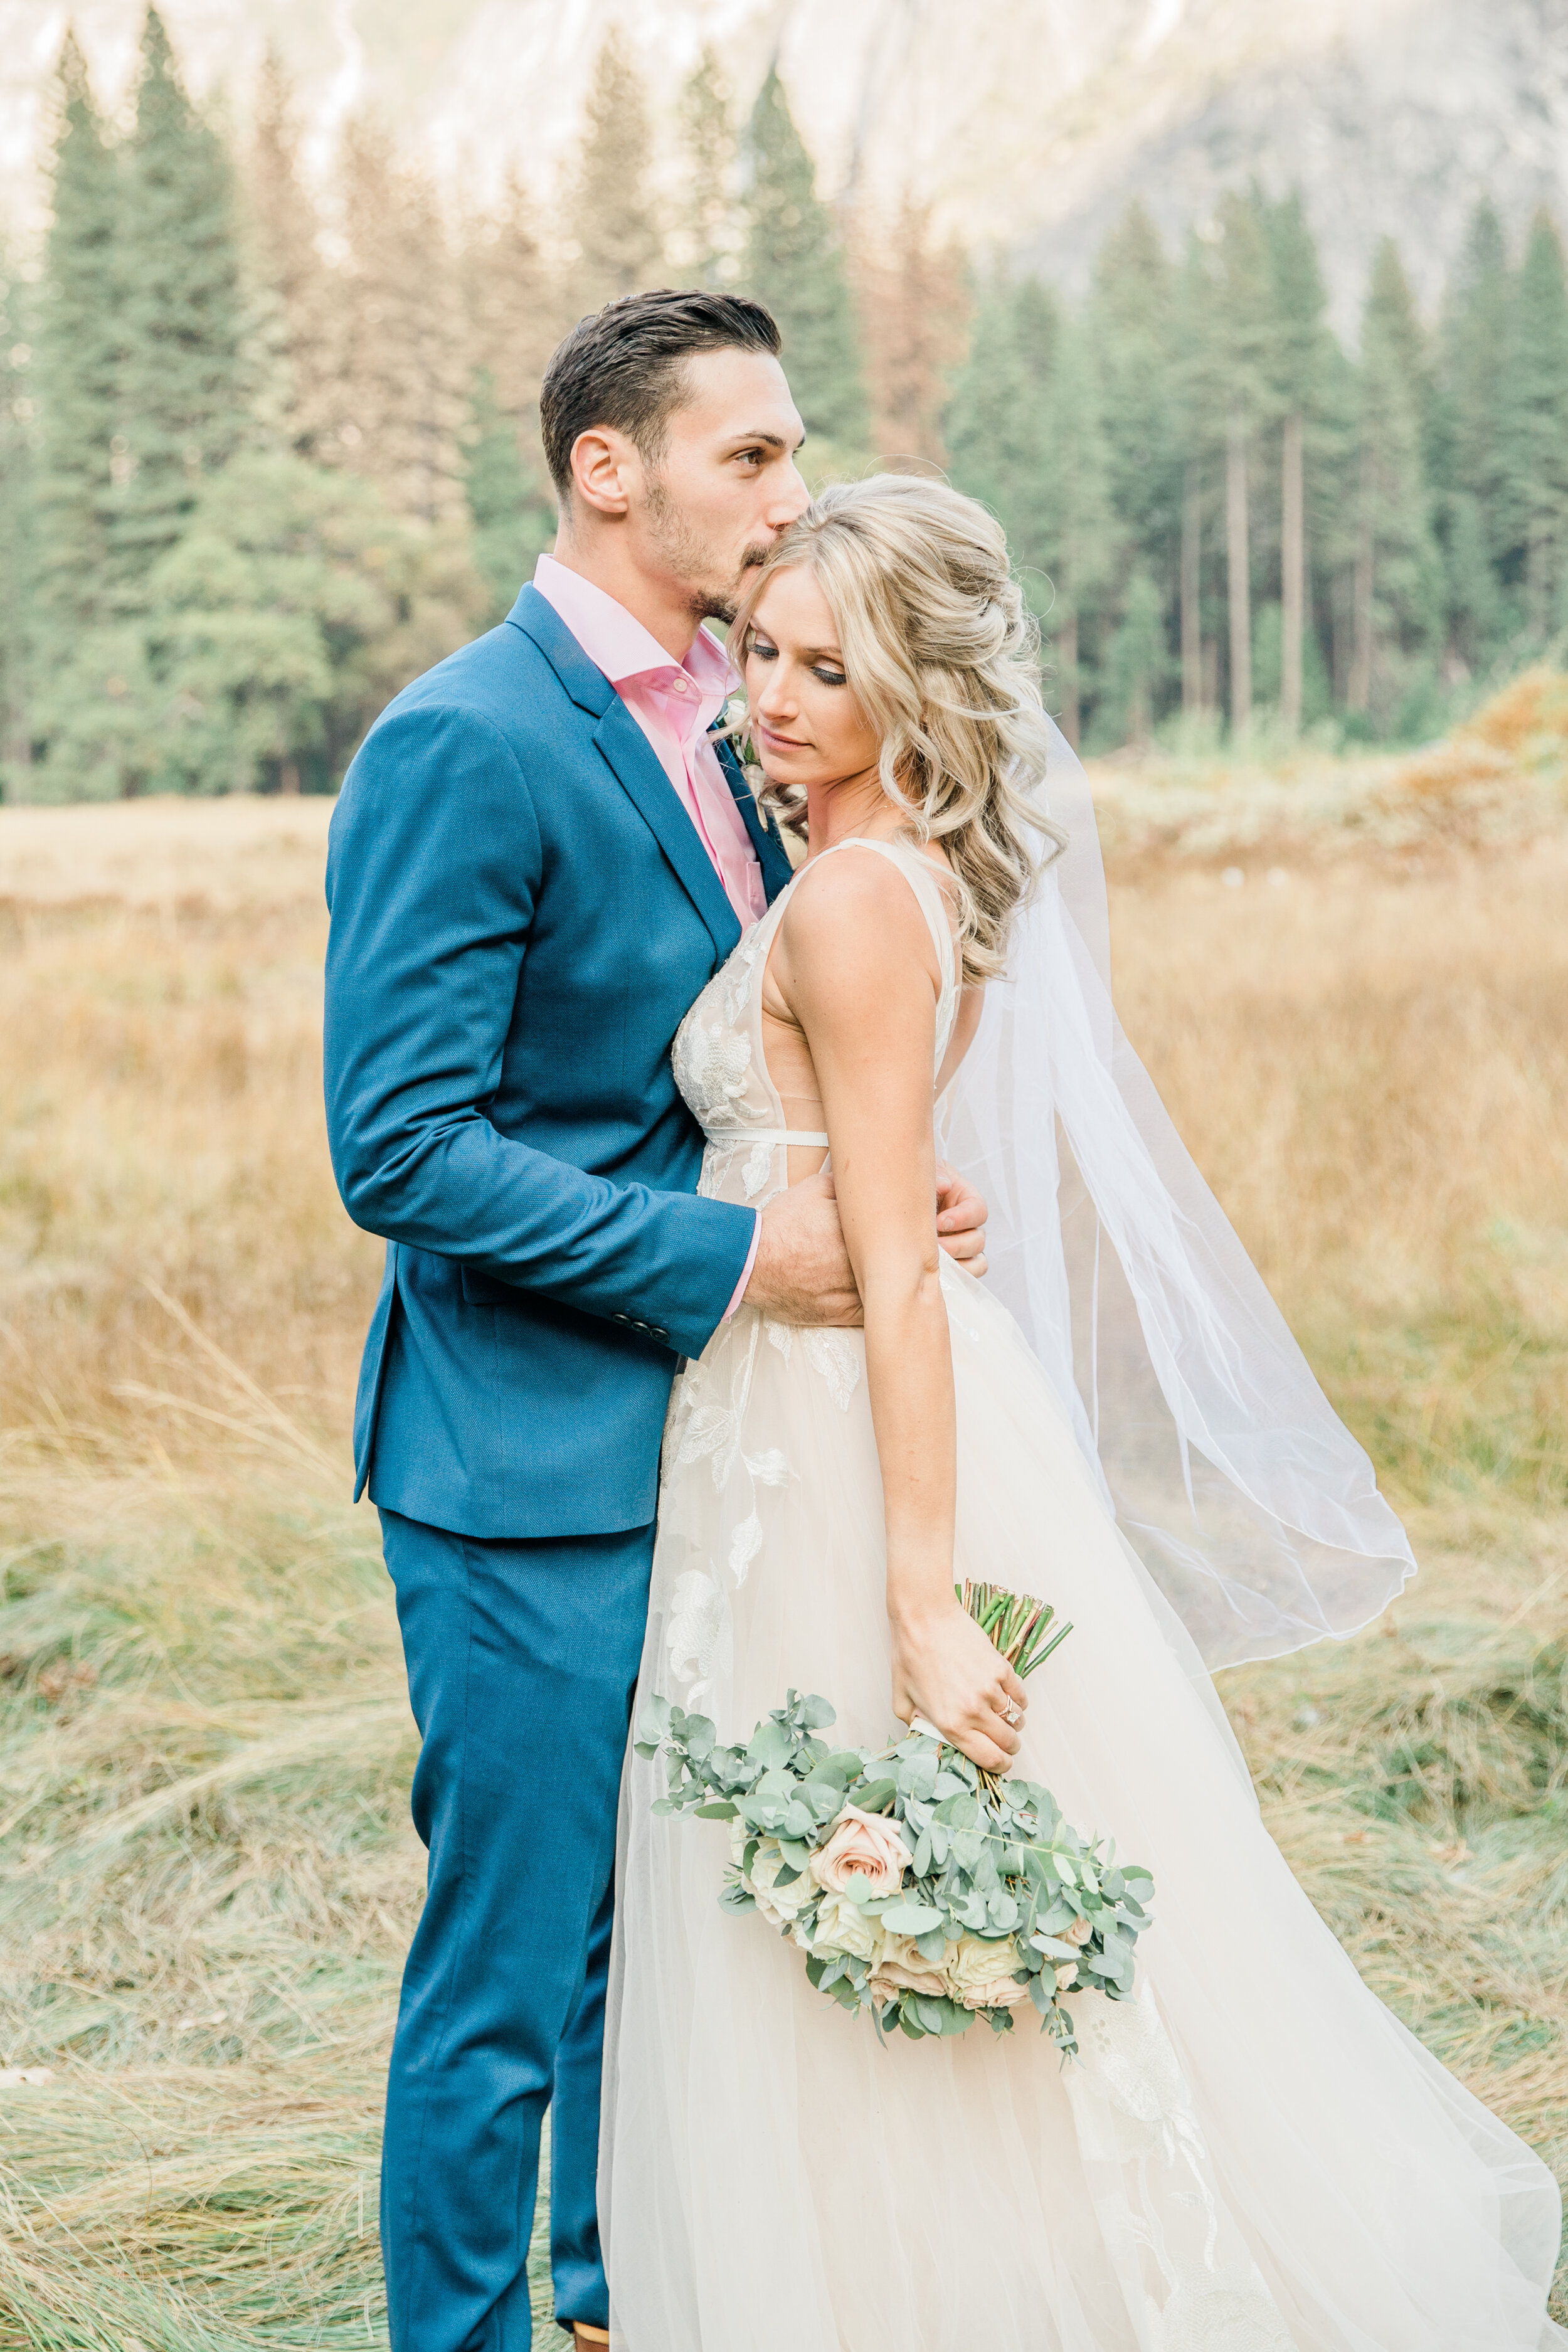 Leanne and Joe - Married - Sneak Peeks - Lauren Alisse Photography-34.jpg